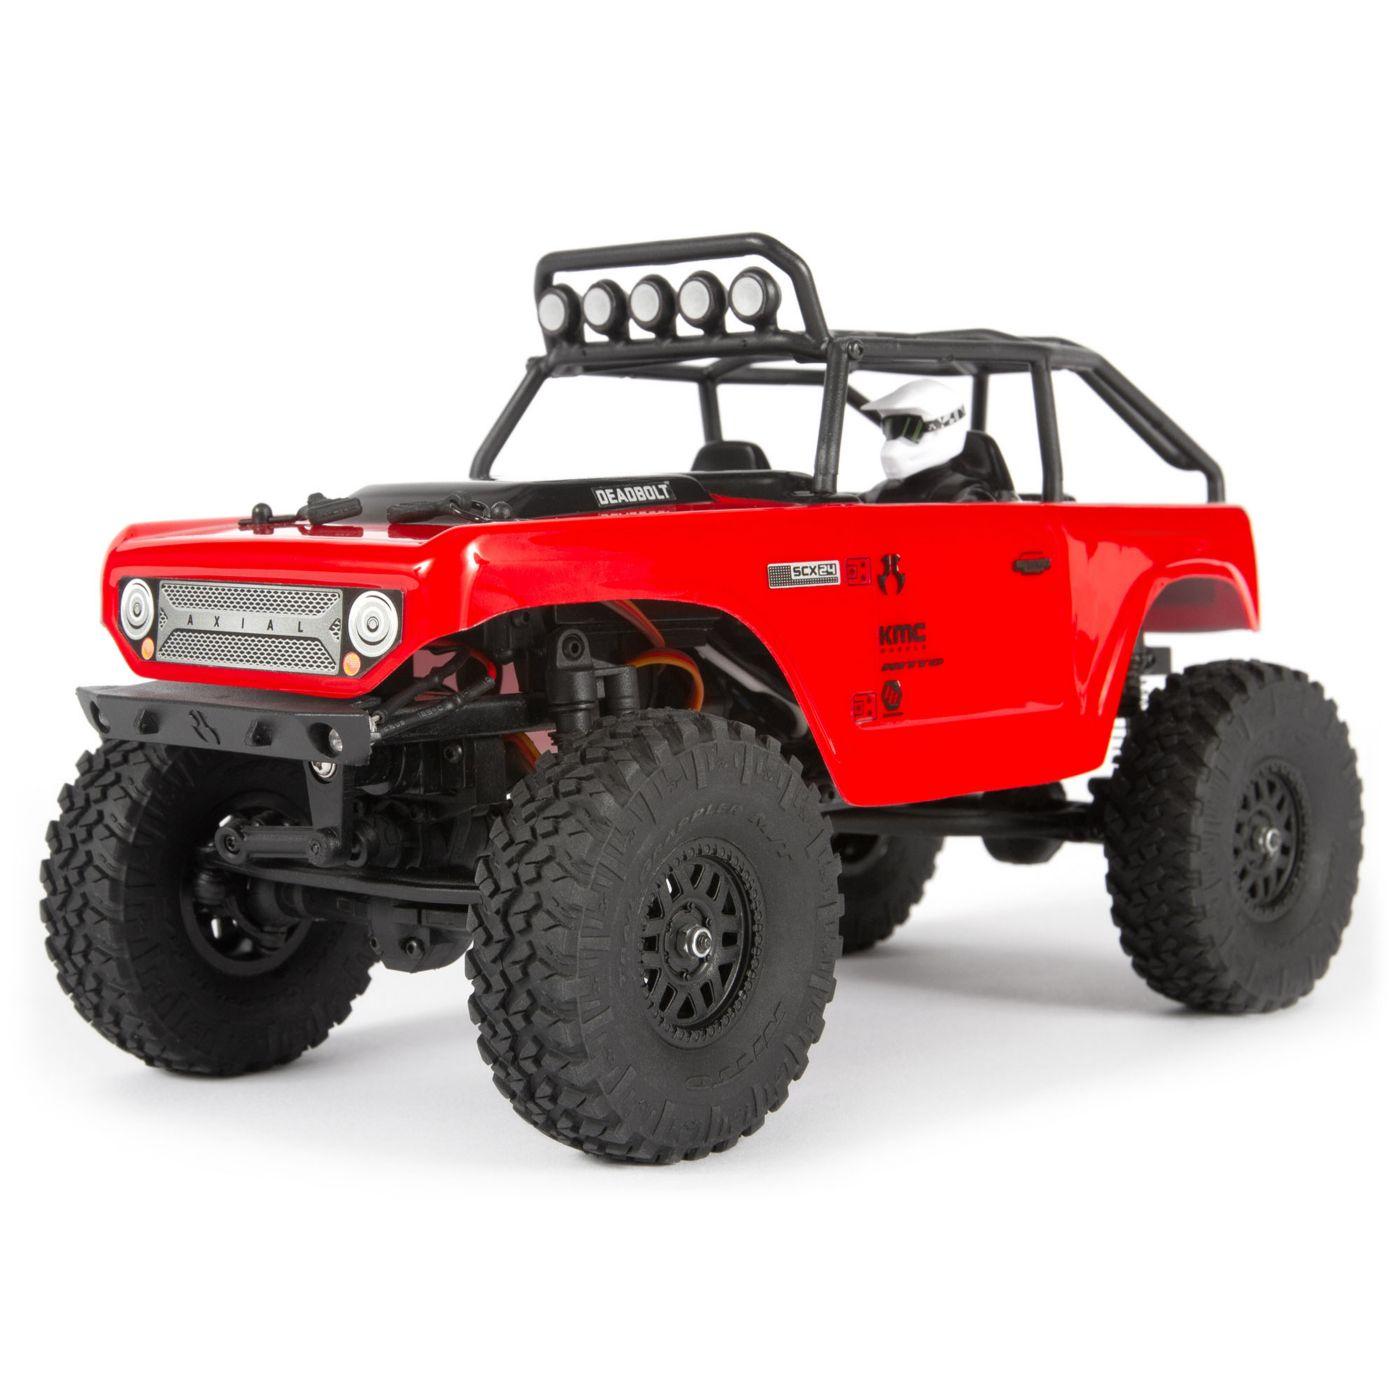 Модель для трофи Axial SCX24 Deadbolt 4WD 1:24, электро, RTR Red